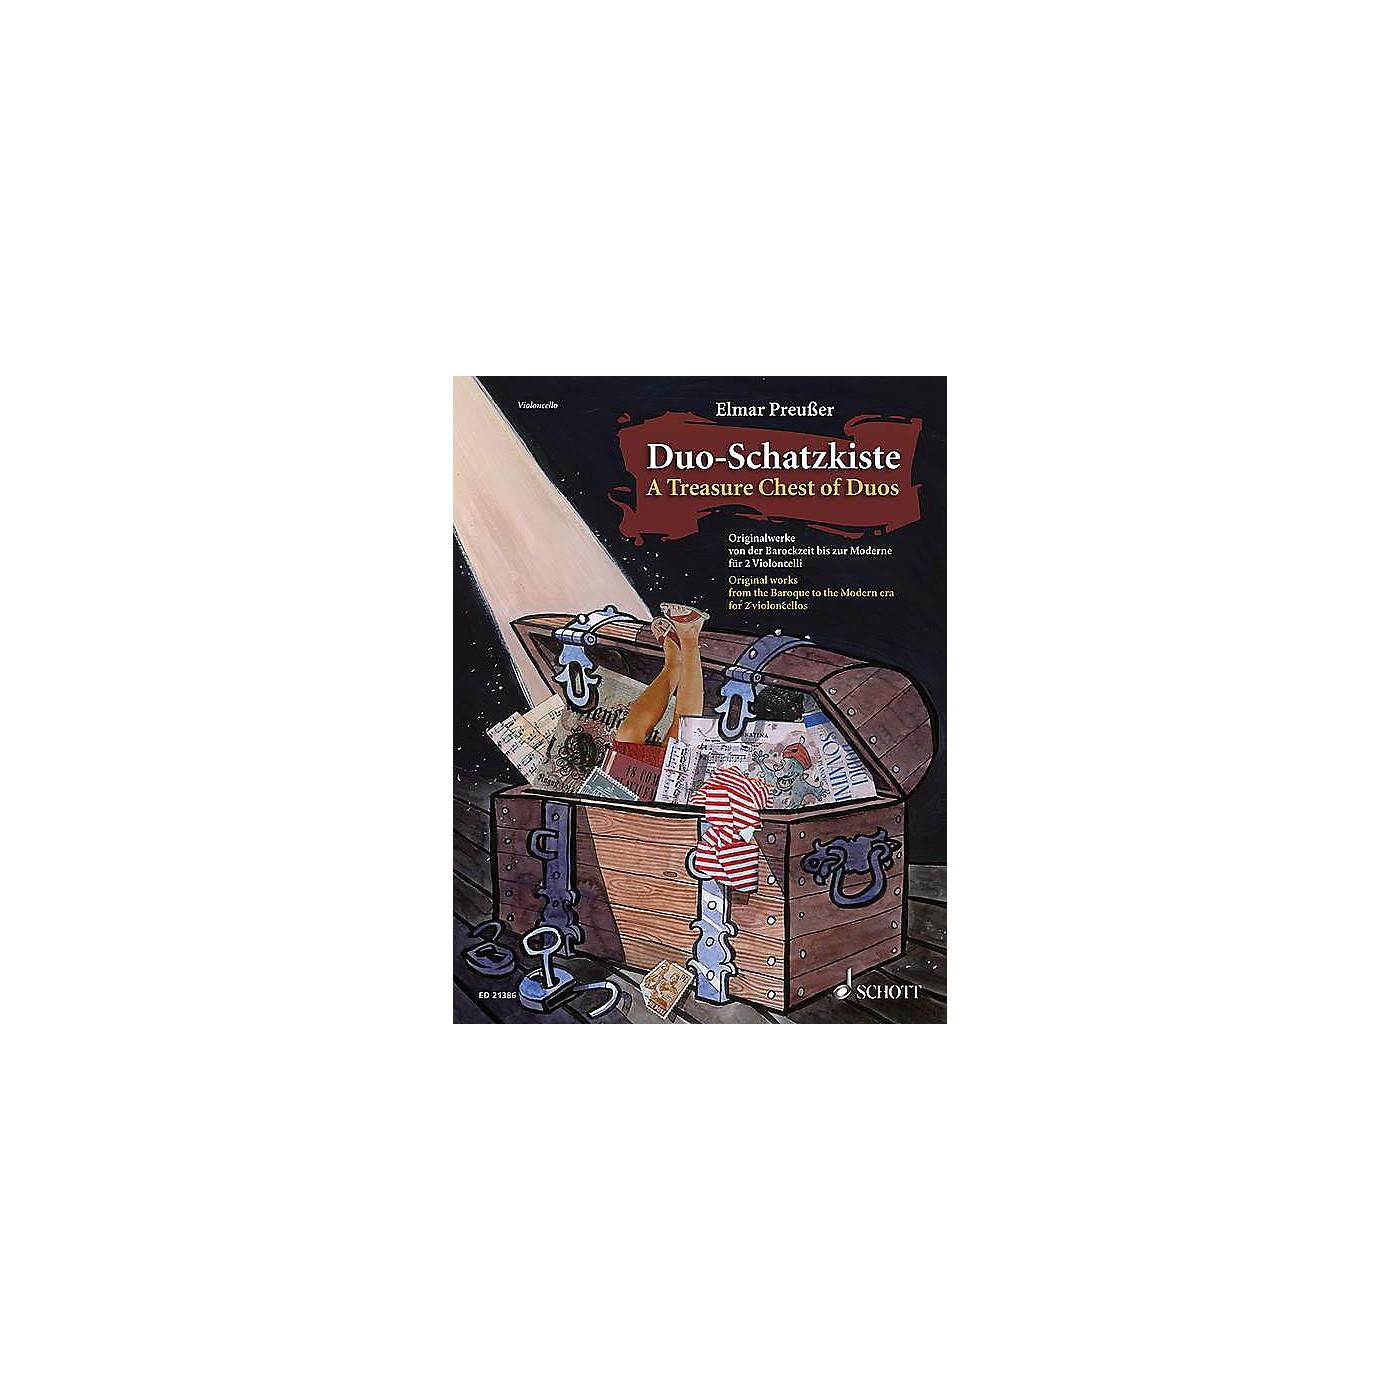 Schott Duo-Schatzkiste (A Treasure Chest of Duos) (Cello Duet Performance Score) String Series Softcover thumbnail